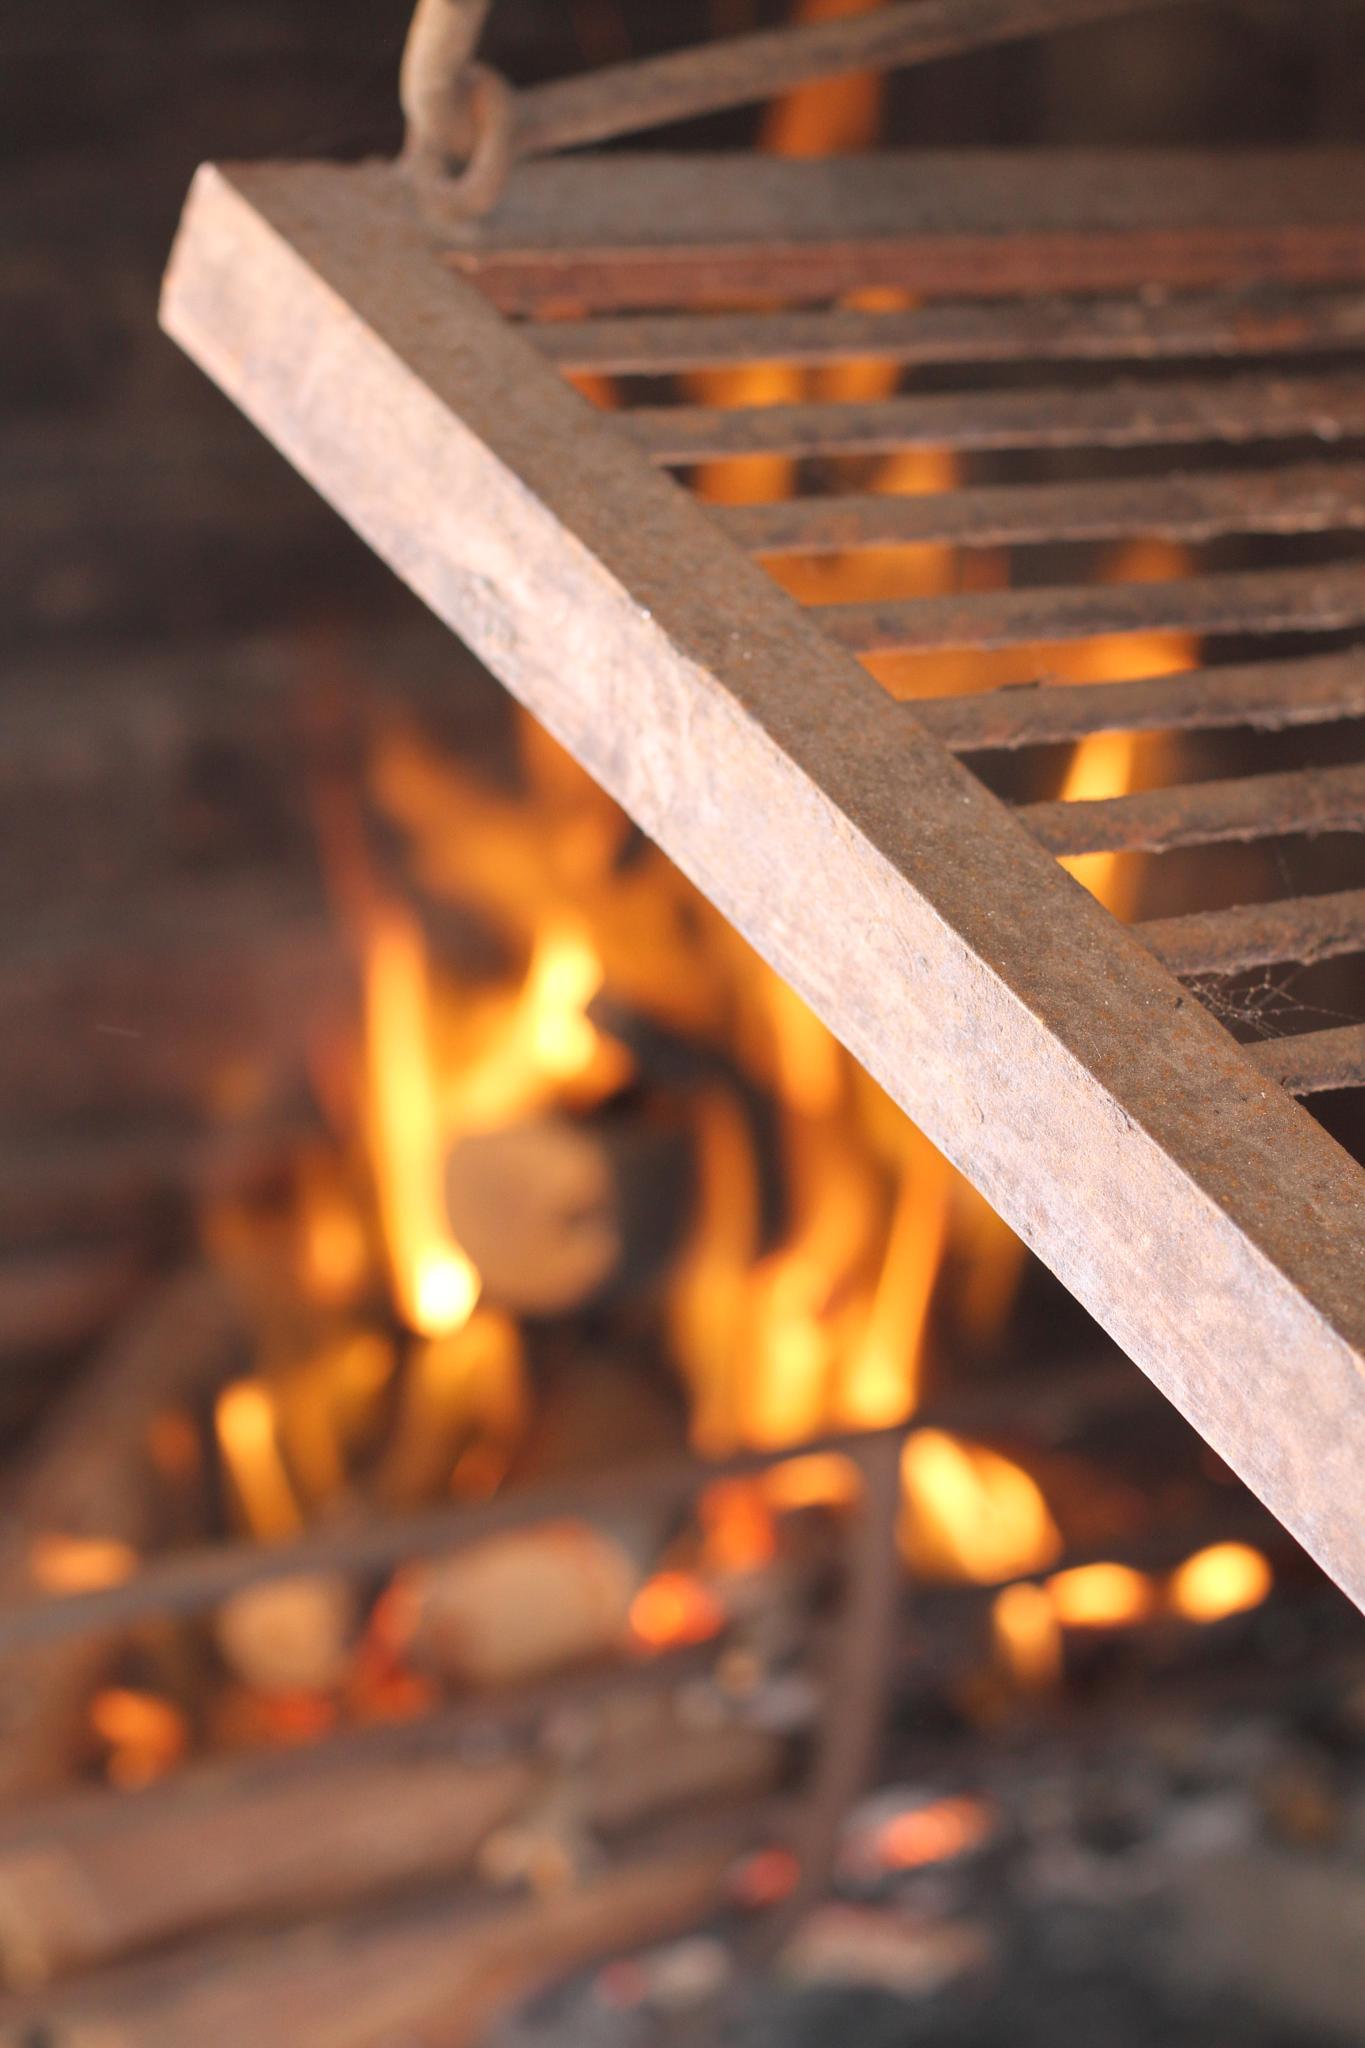 Preparing the BBQ by Miguel Odolfo Gabard Viera